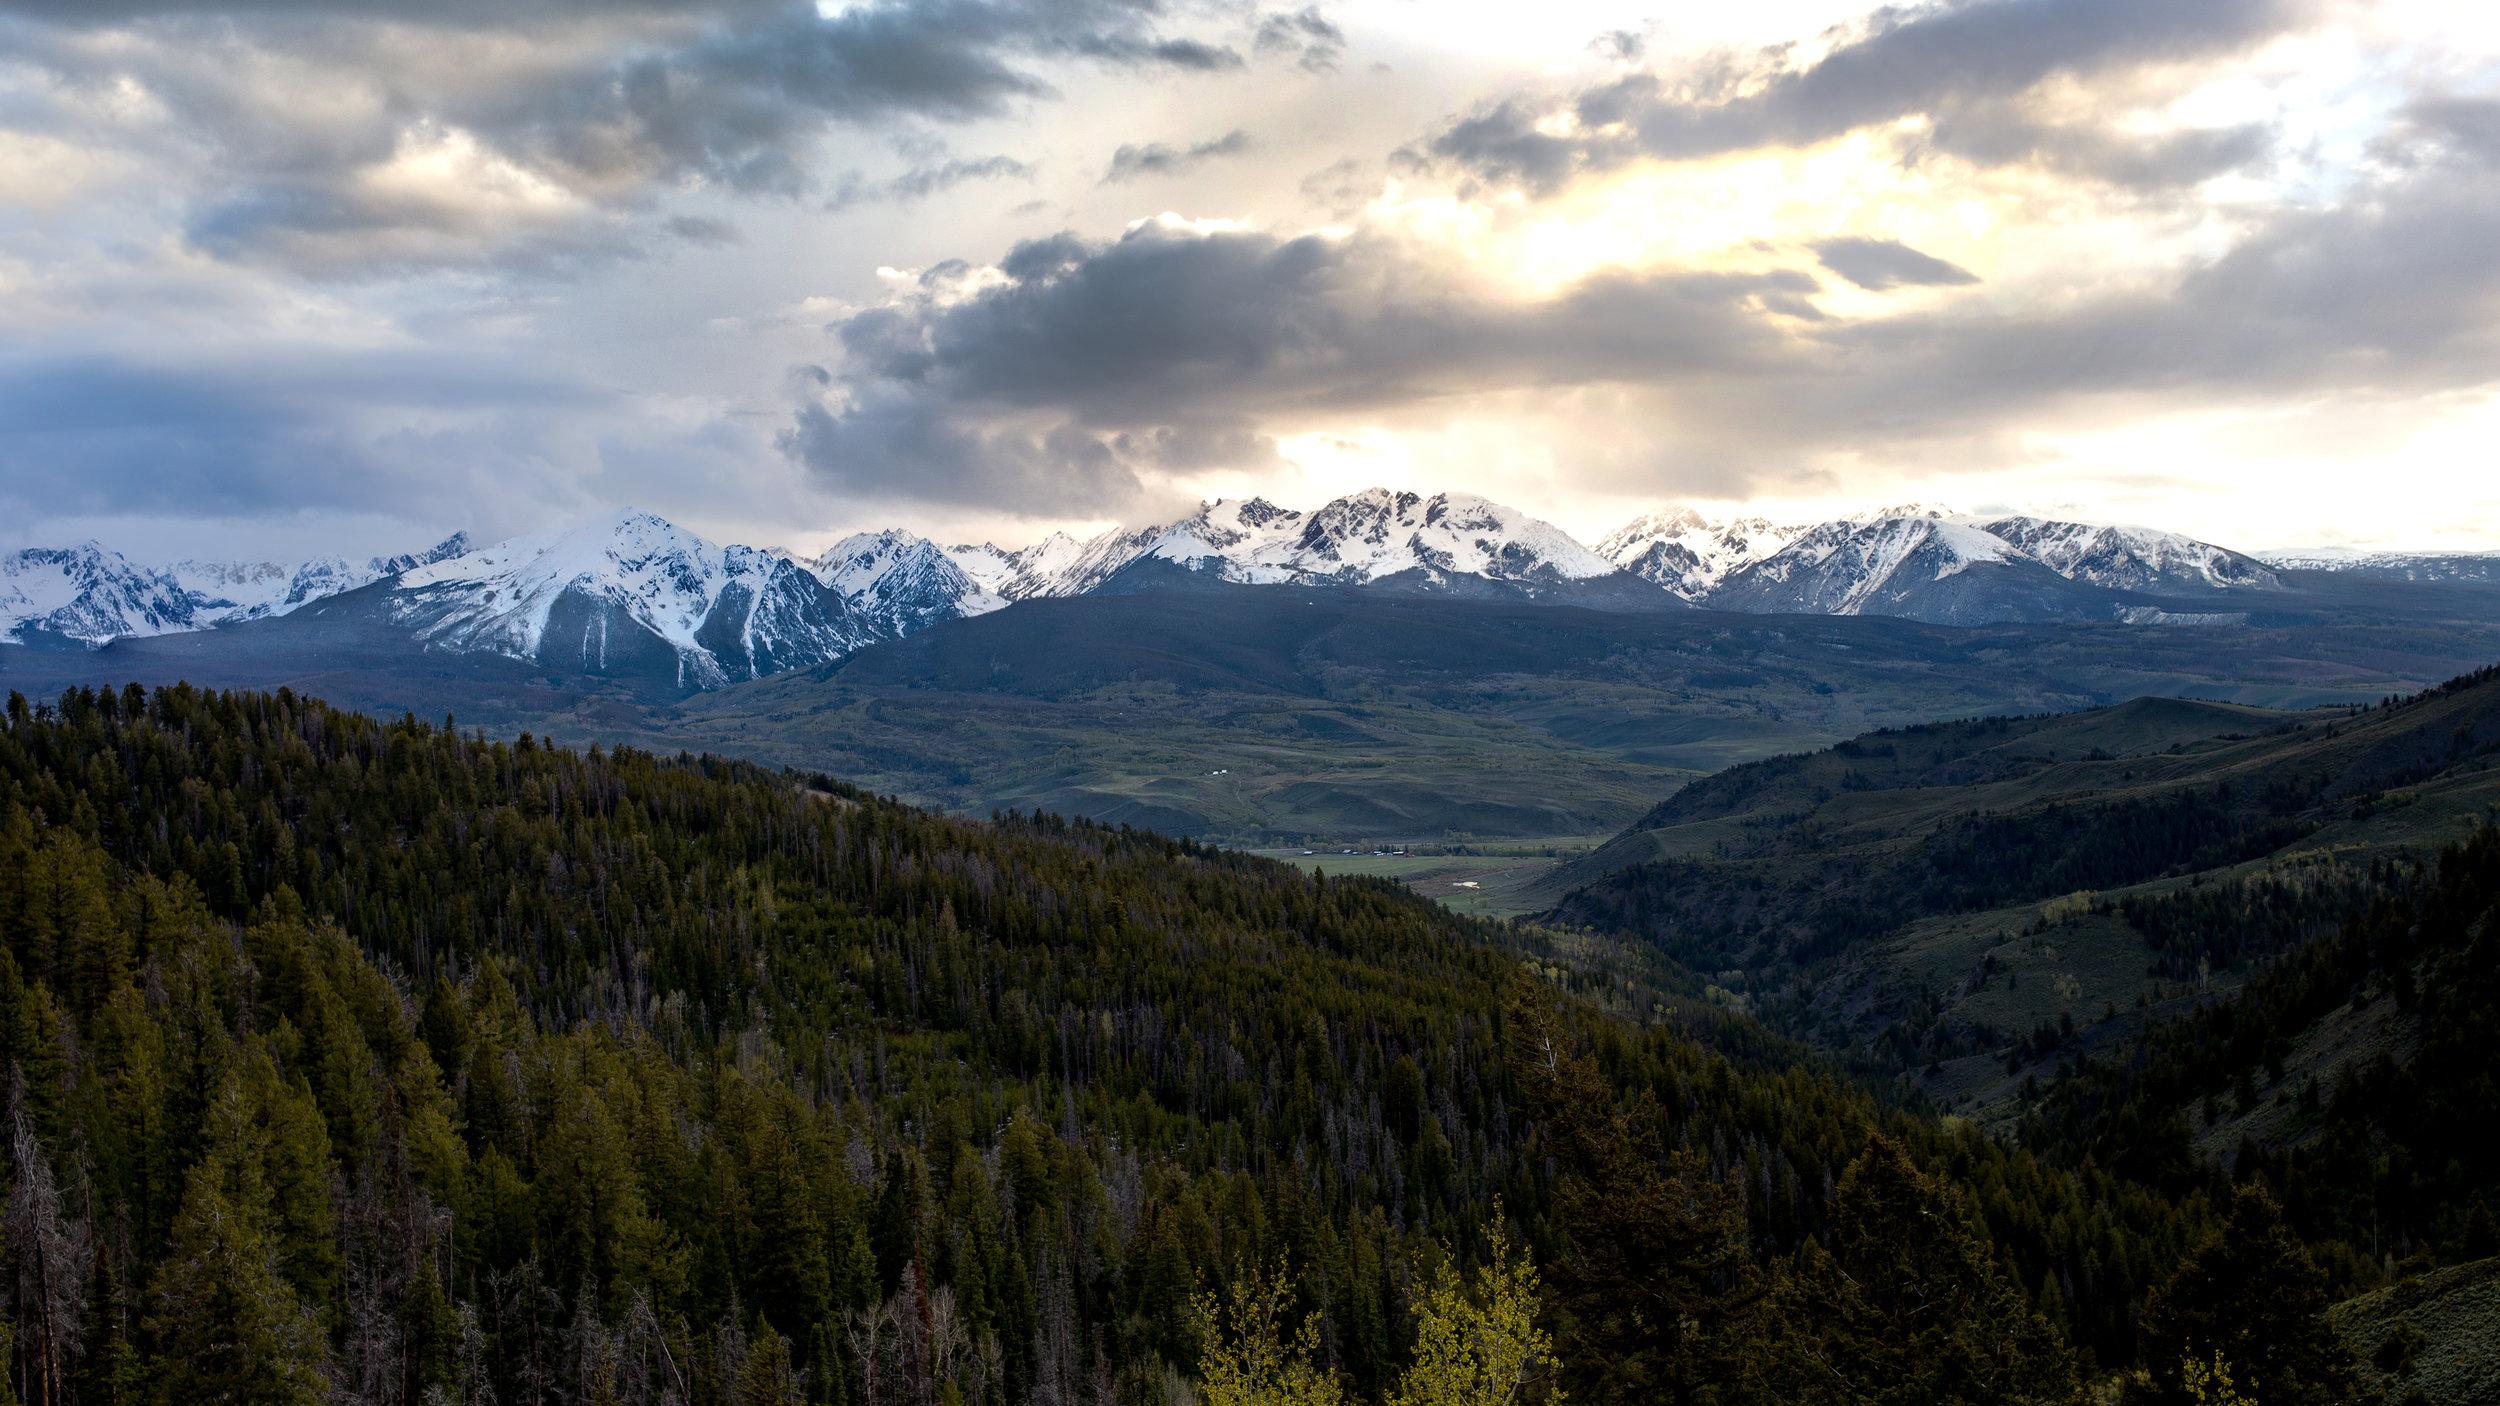 mountains1-cropped.jpg